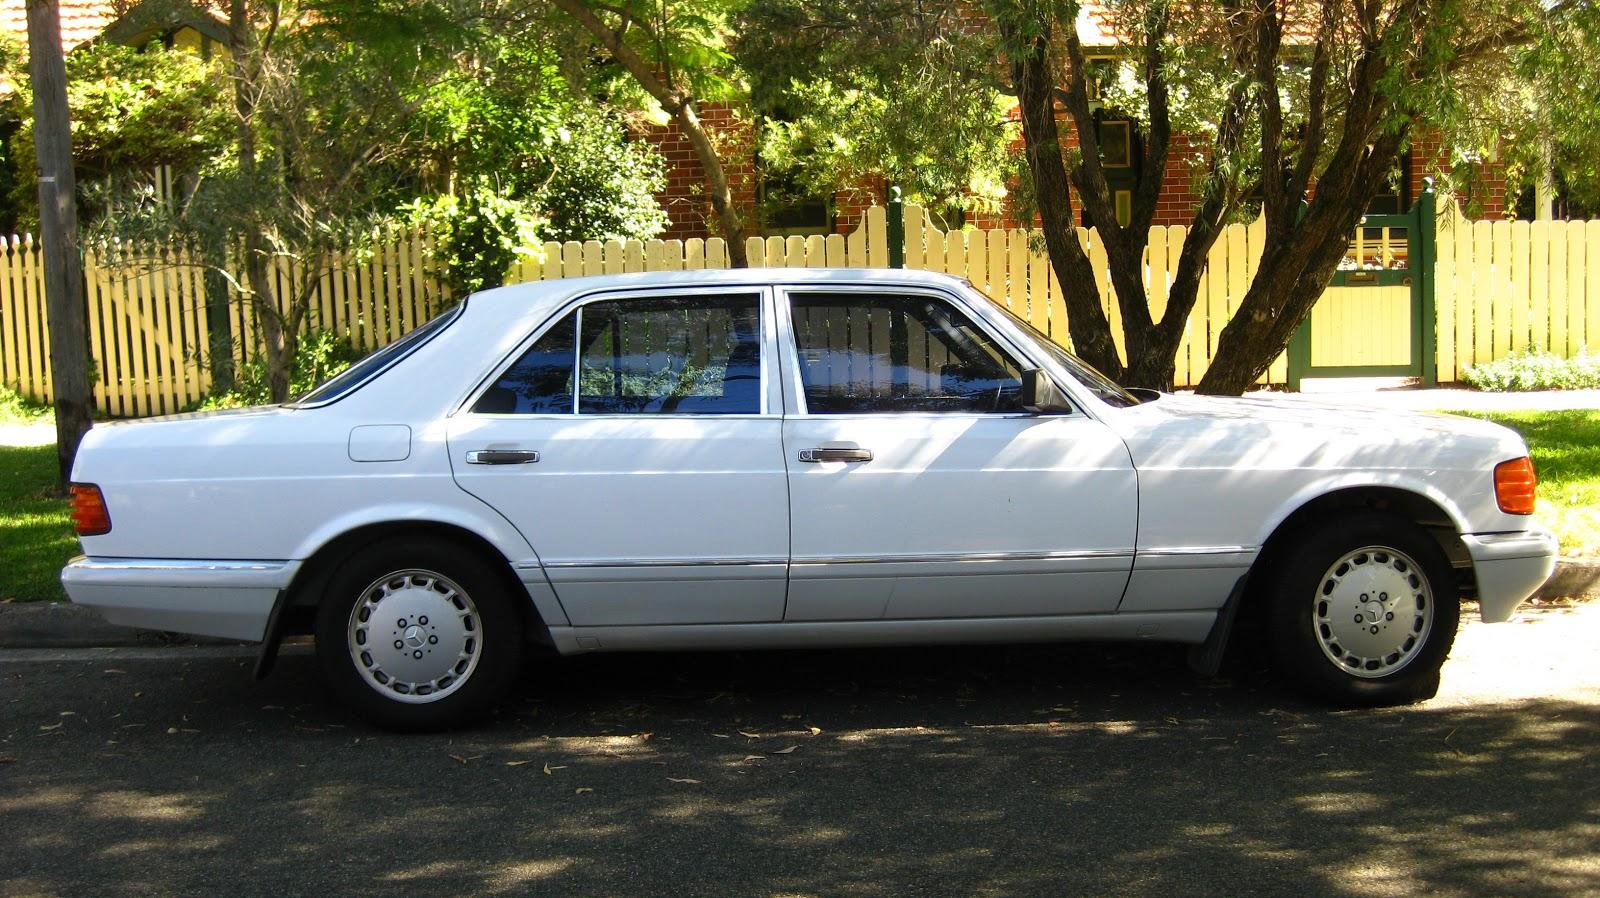 Aussie old parked cars 1988 mercedes benz w126 300 se for 1988 mercedes benz